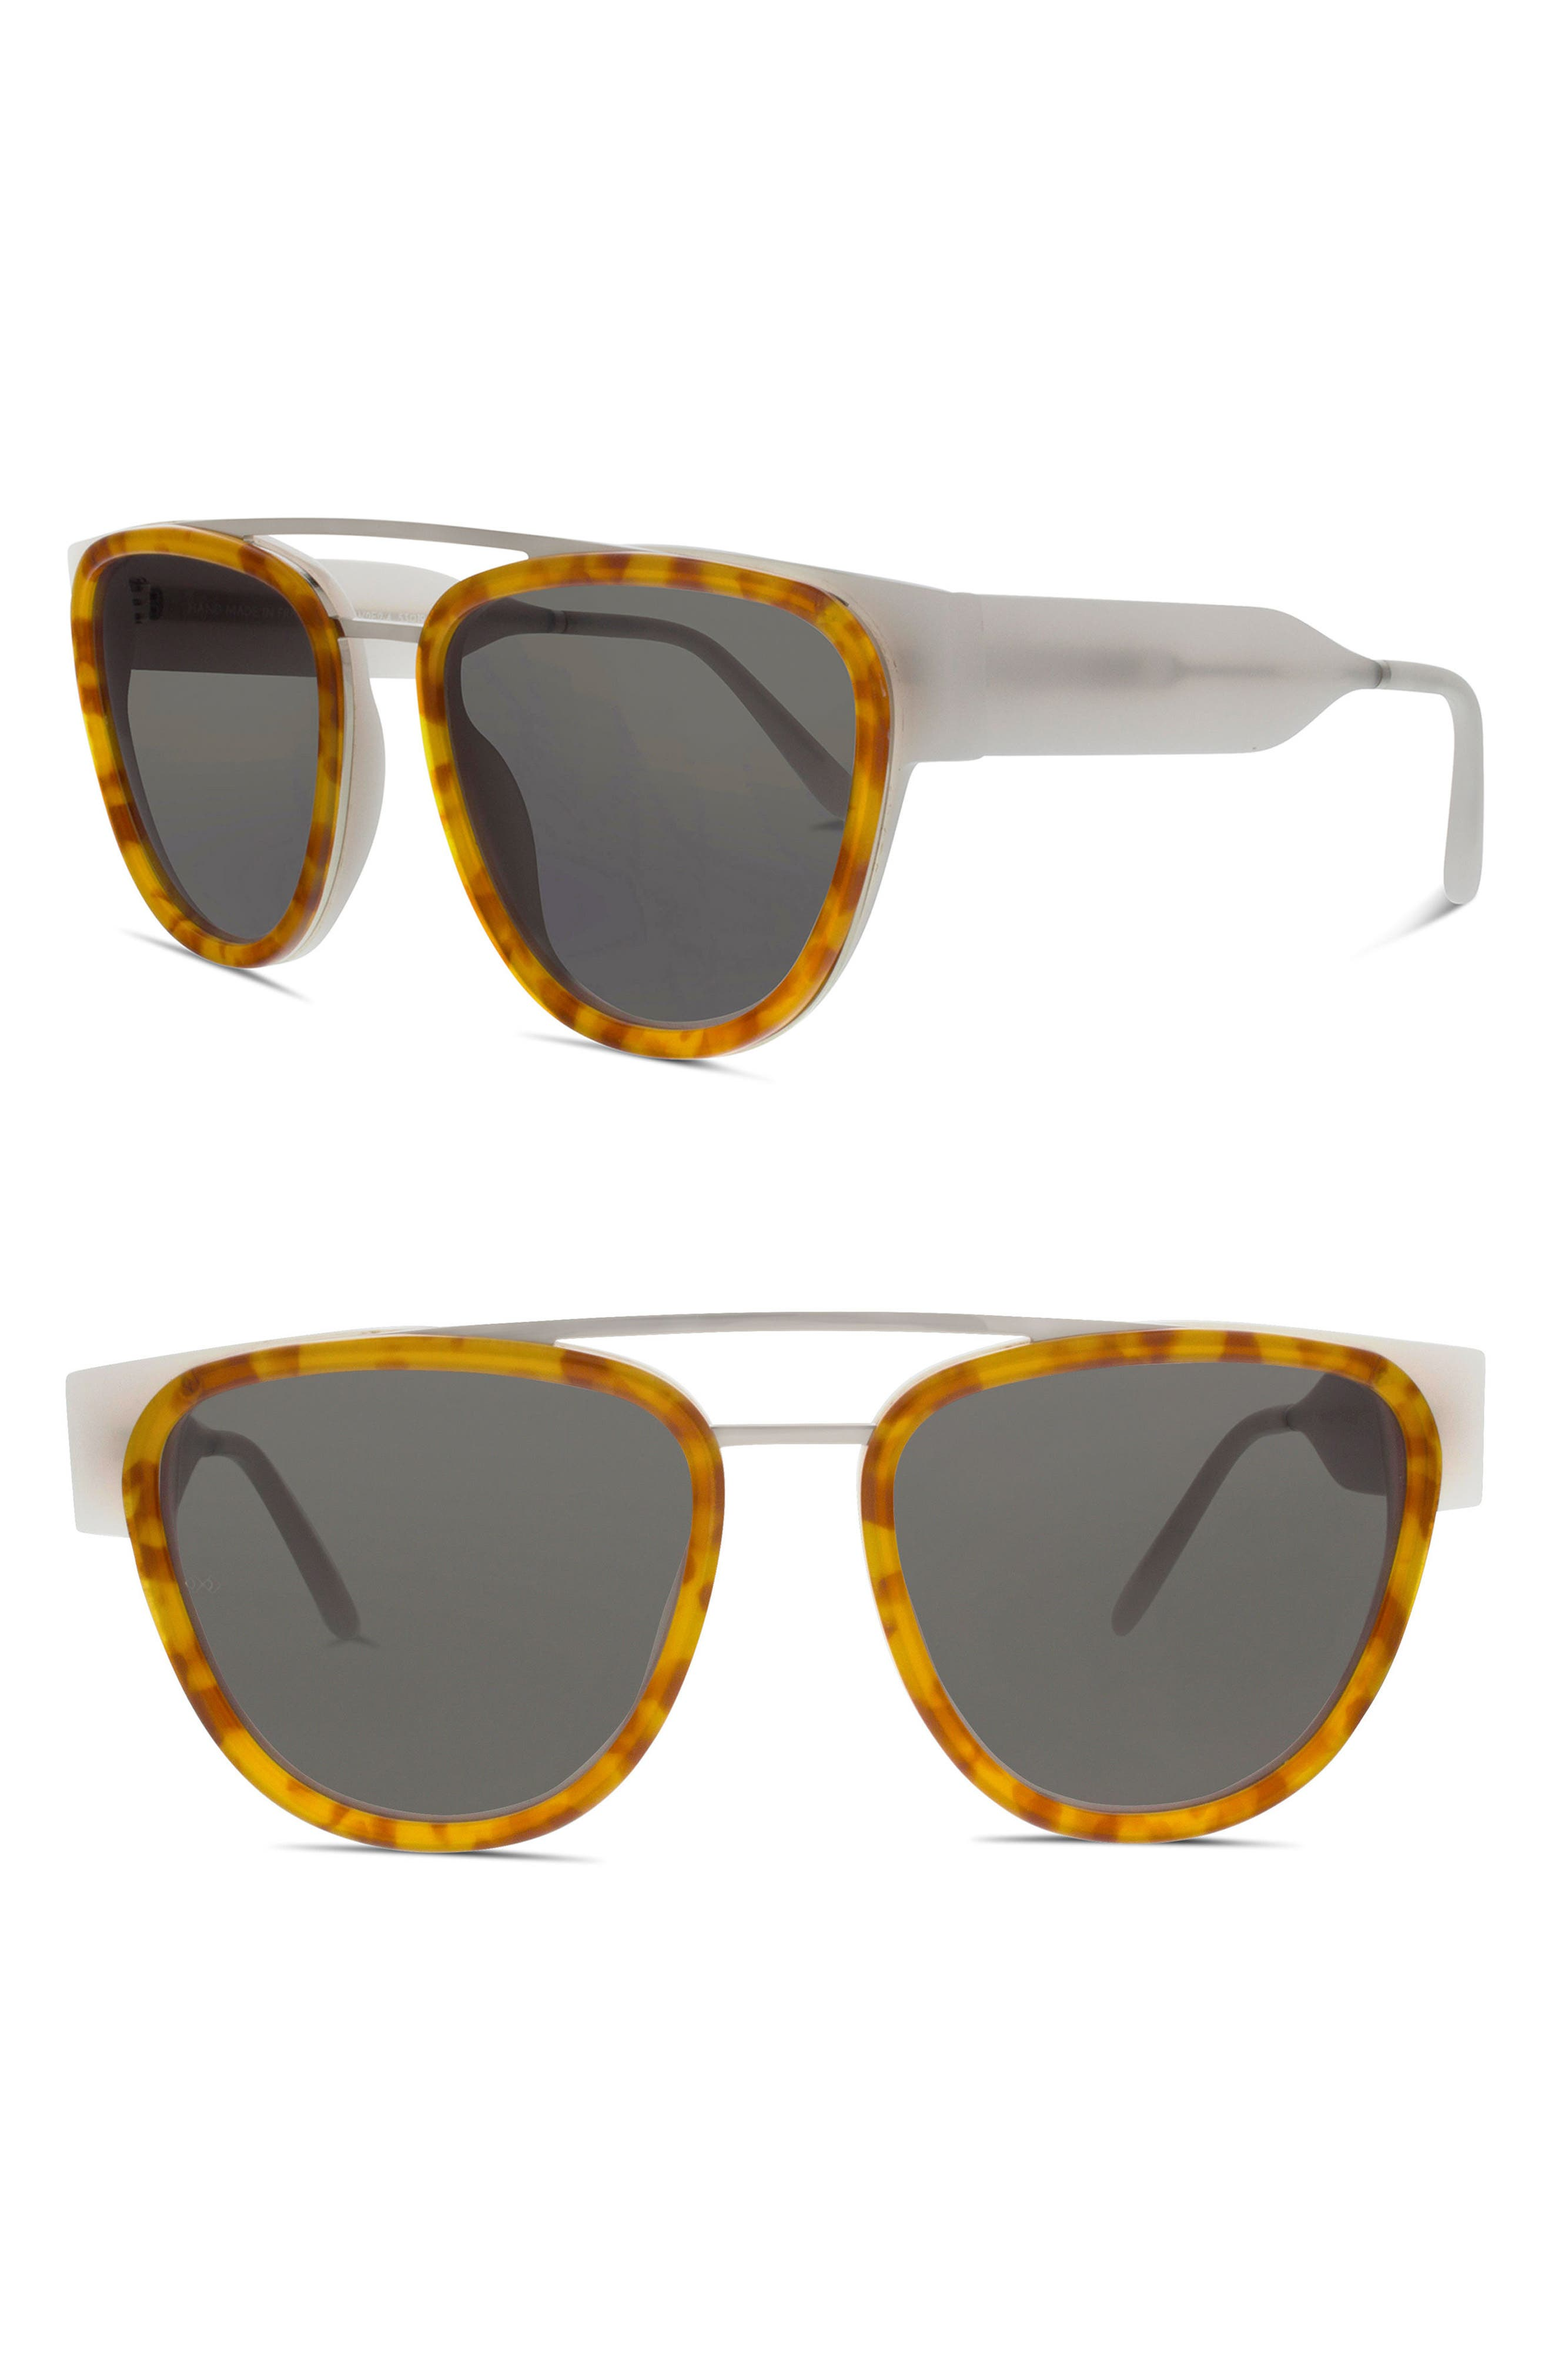 SMOKE X MIRRORS Soda Pop II 53mm Square Sunglasses